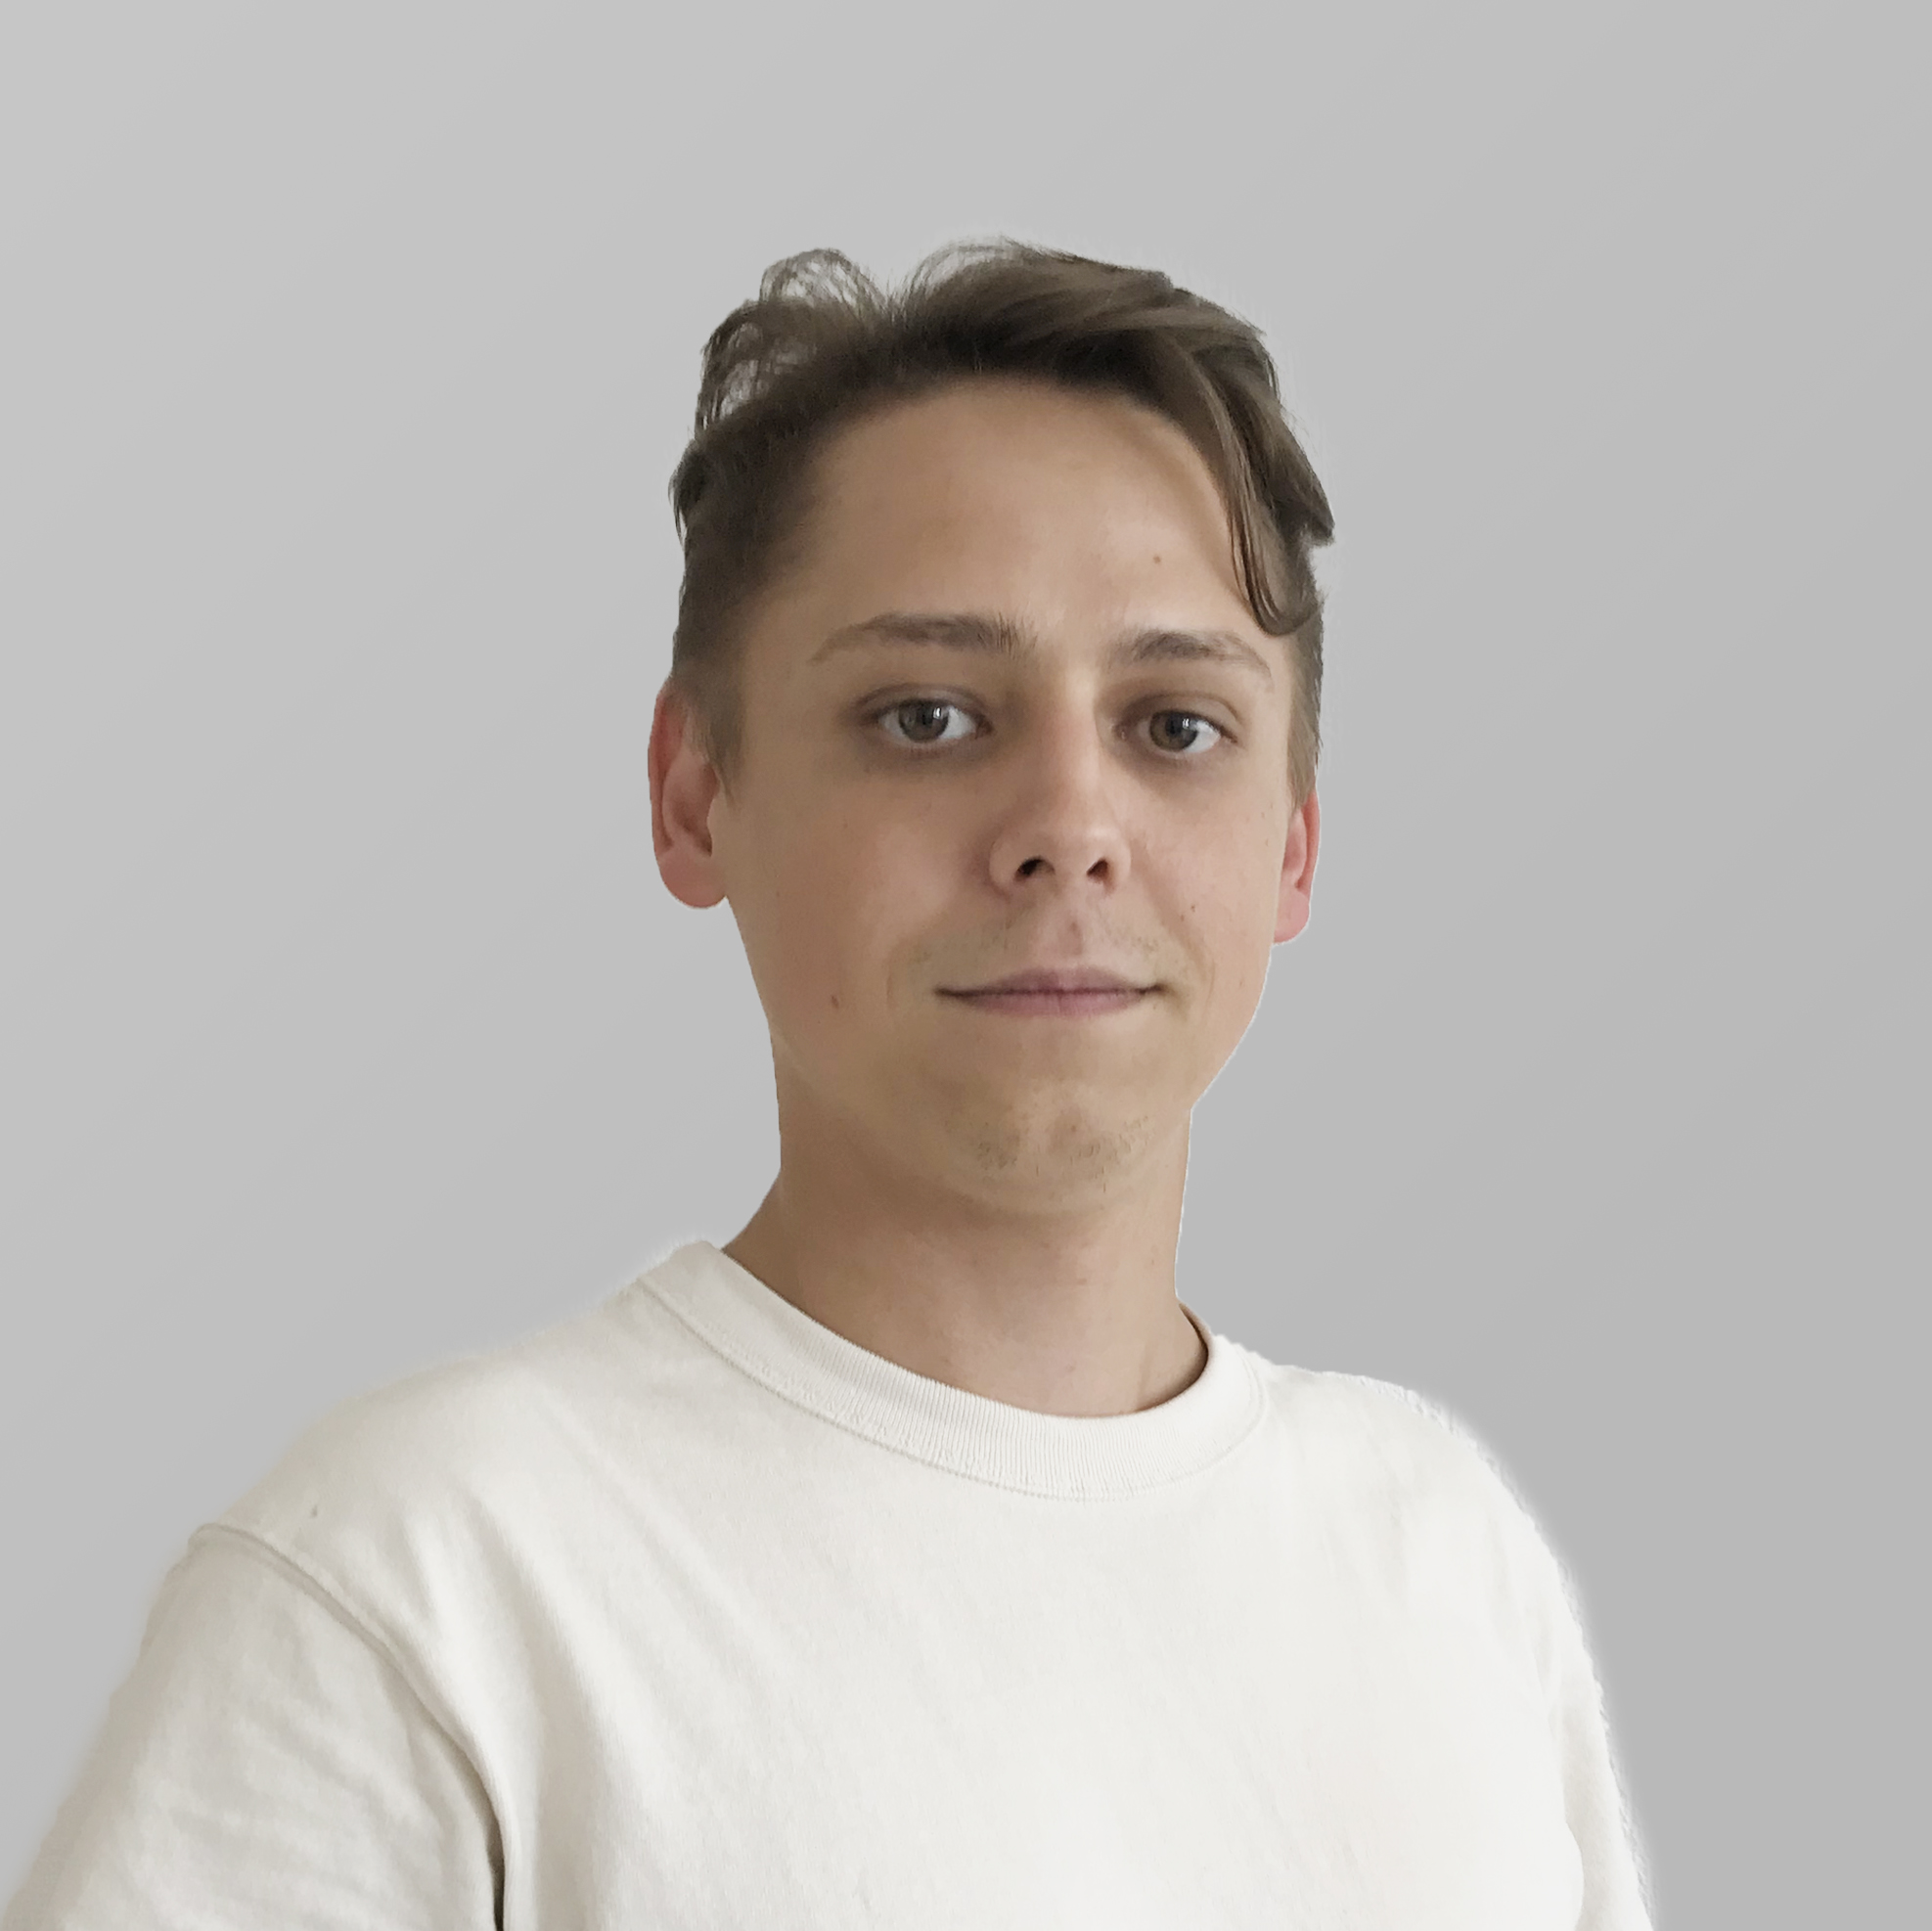 Сабиров Айдар Рустэмович